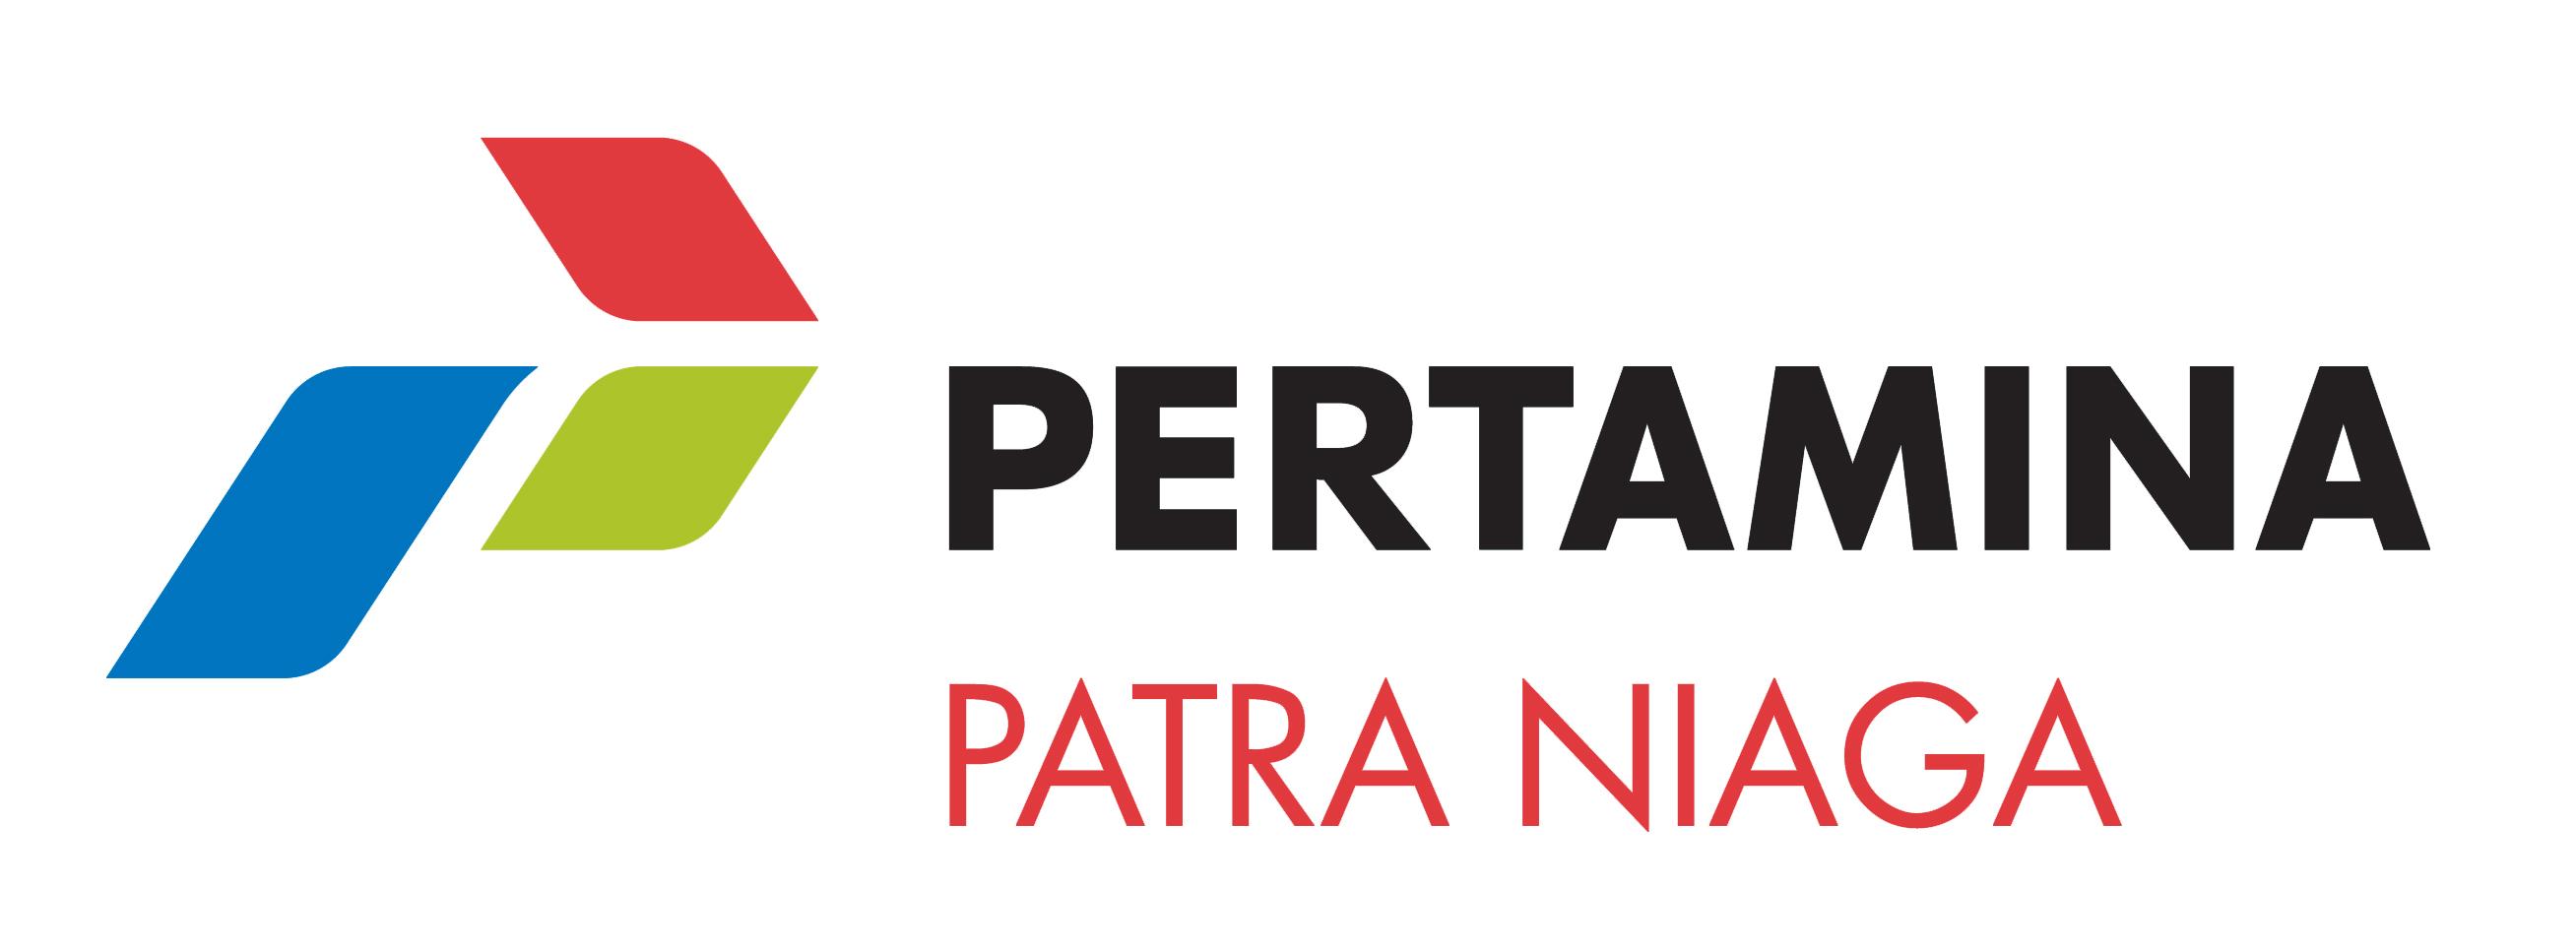 PT Pertamina Patra Niaga Region III Jateng, DIY, Jatim, Bali, Nusa Tenggara